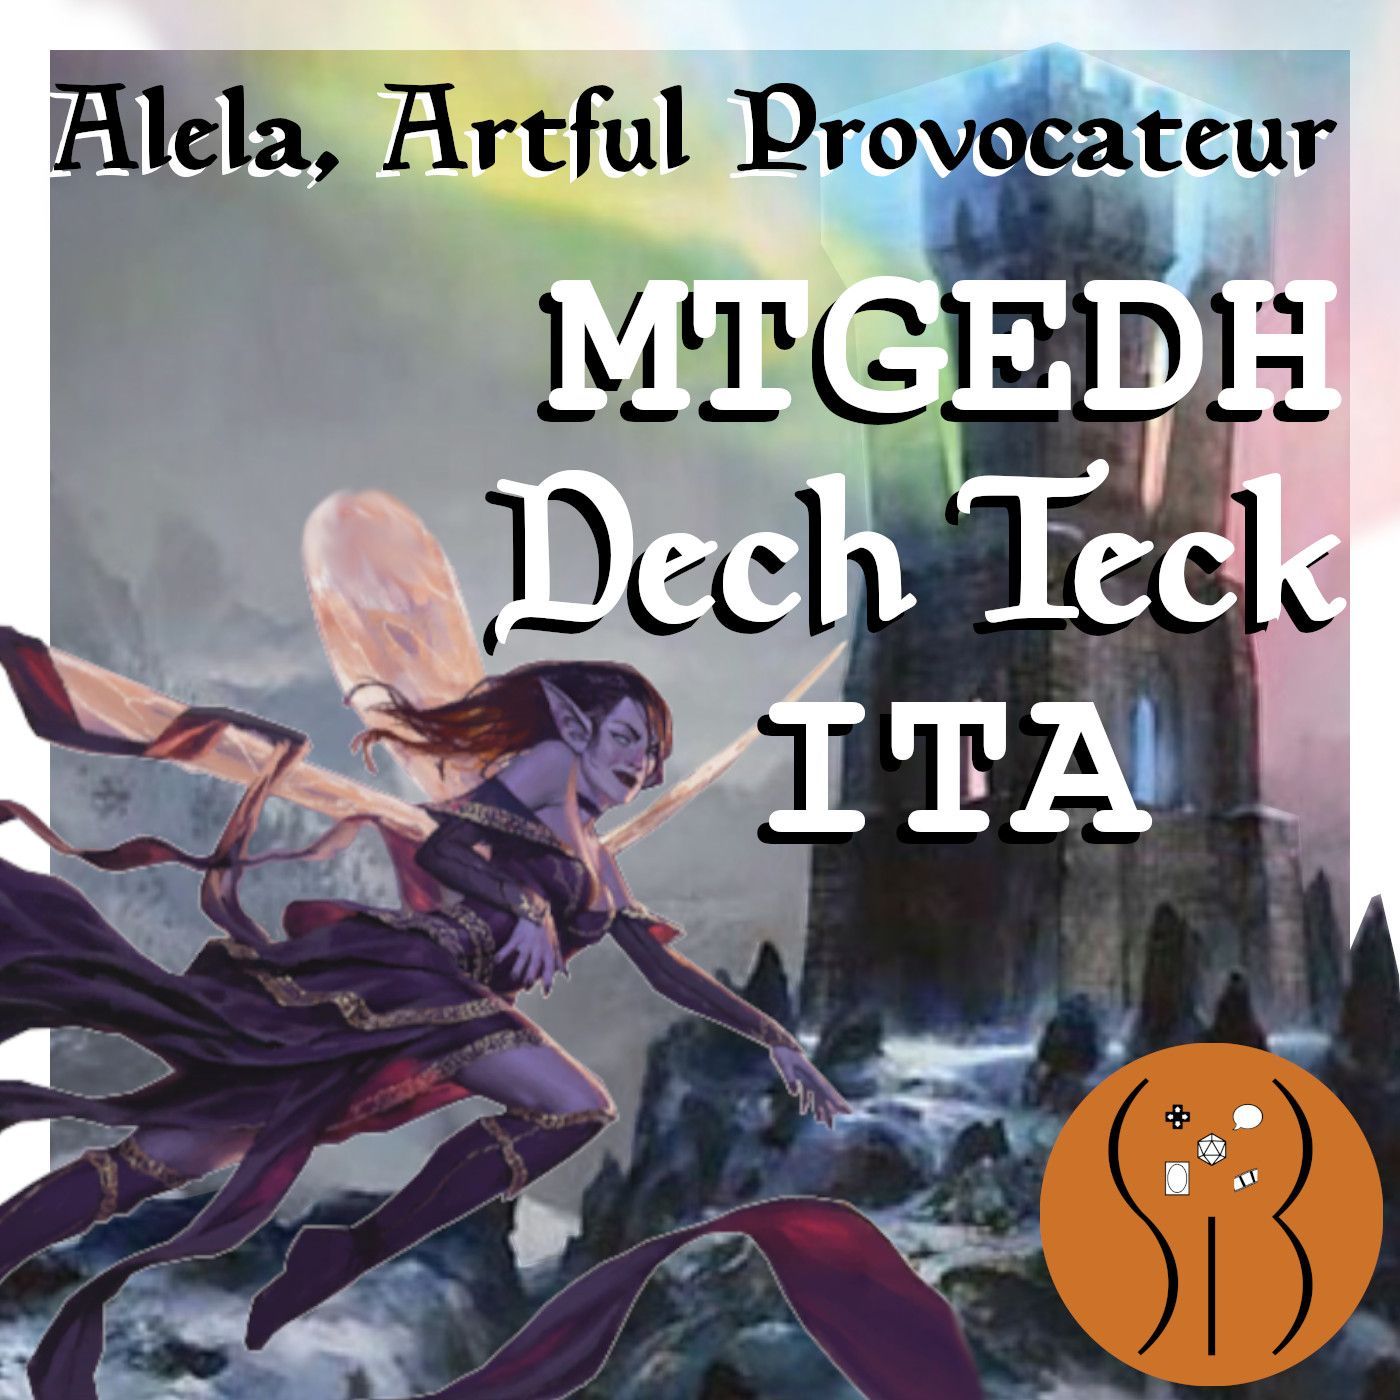 Alela Artful Provocateur MTGEDH deck tech ITA